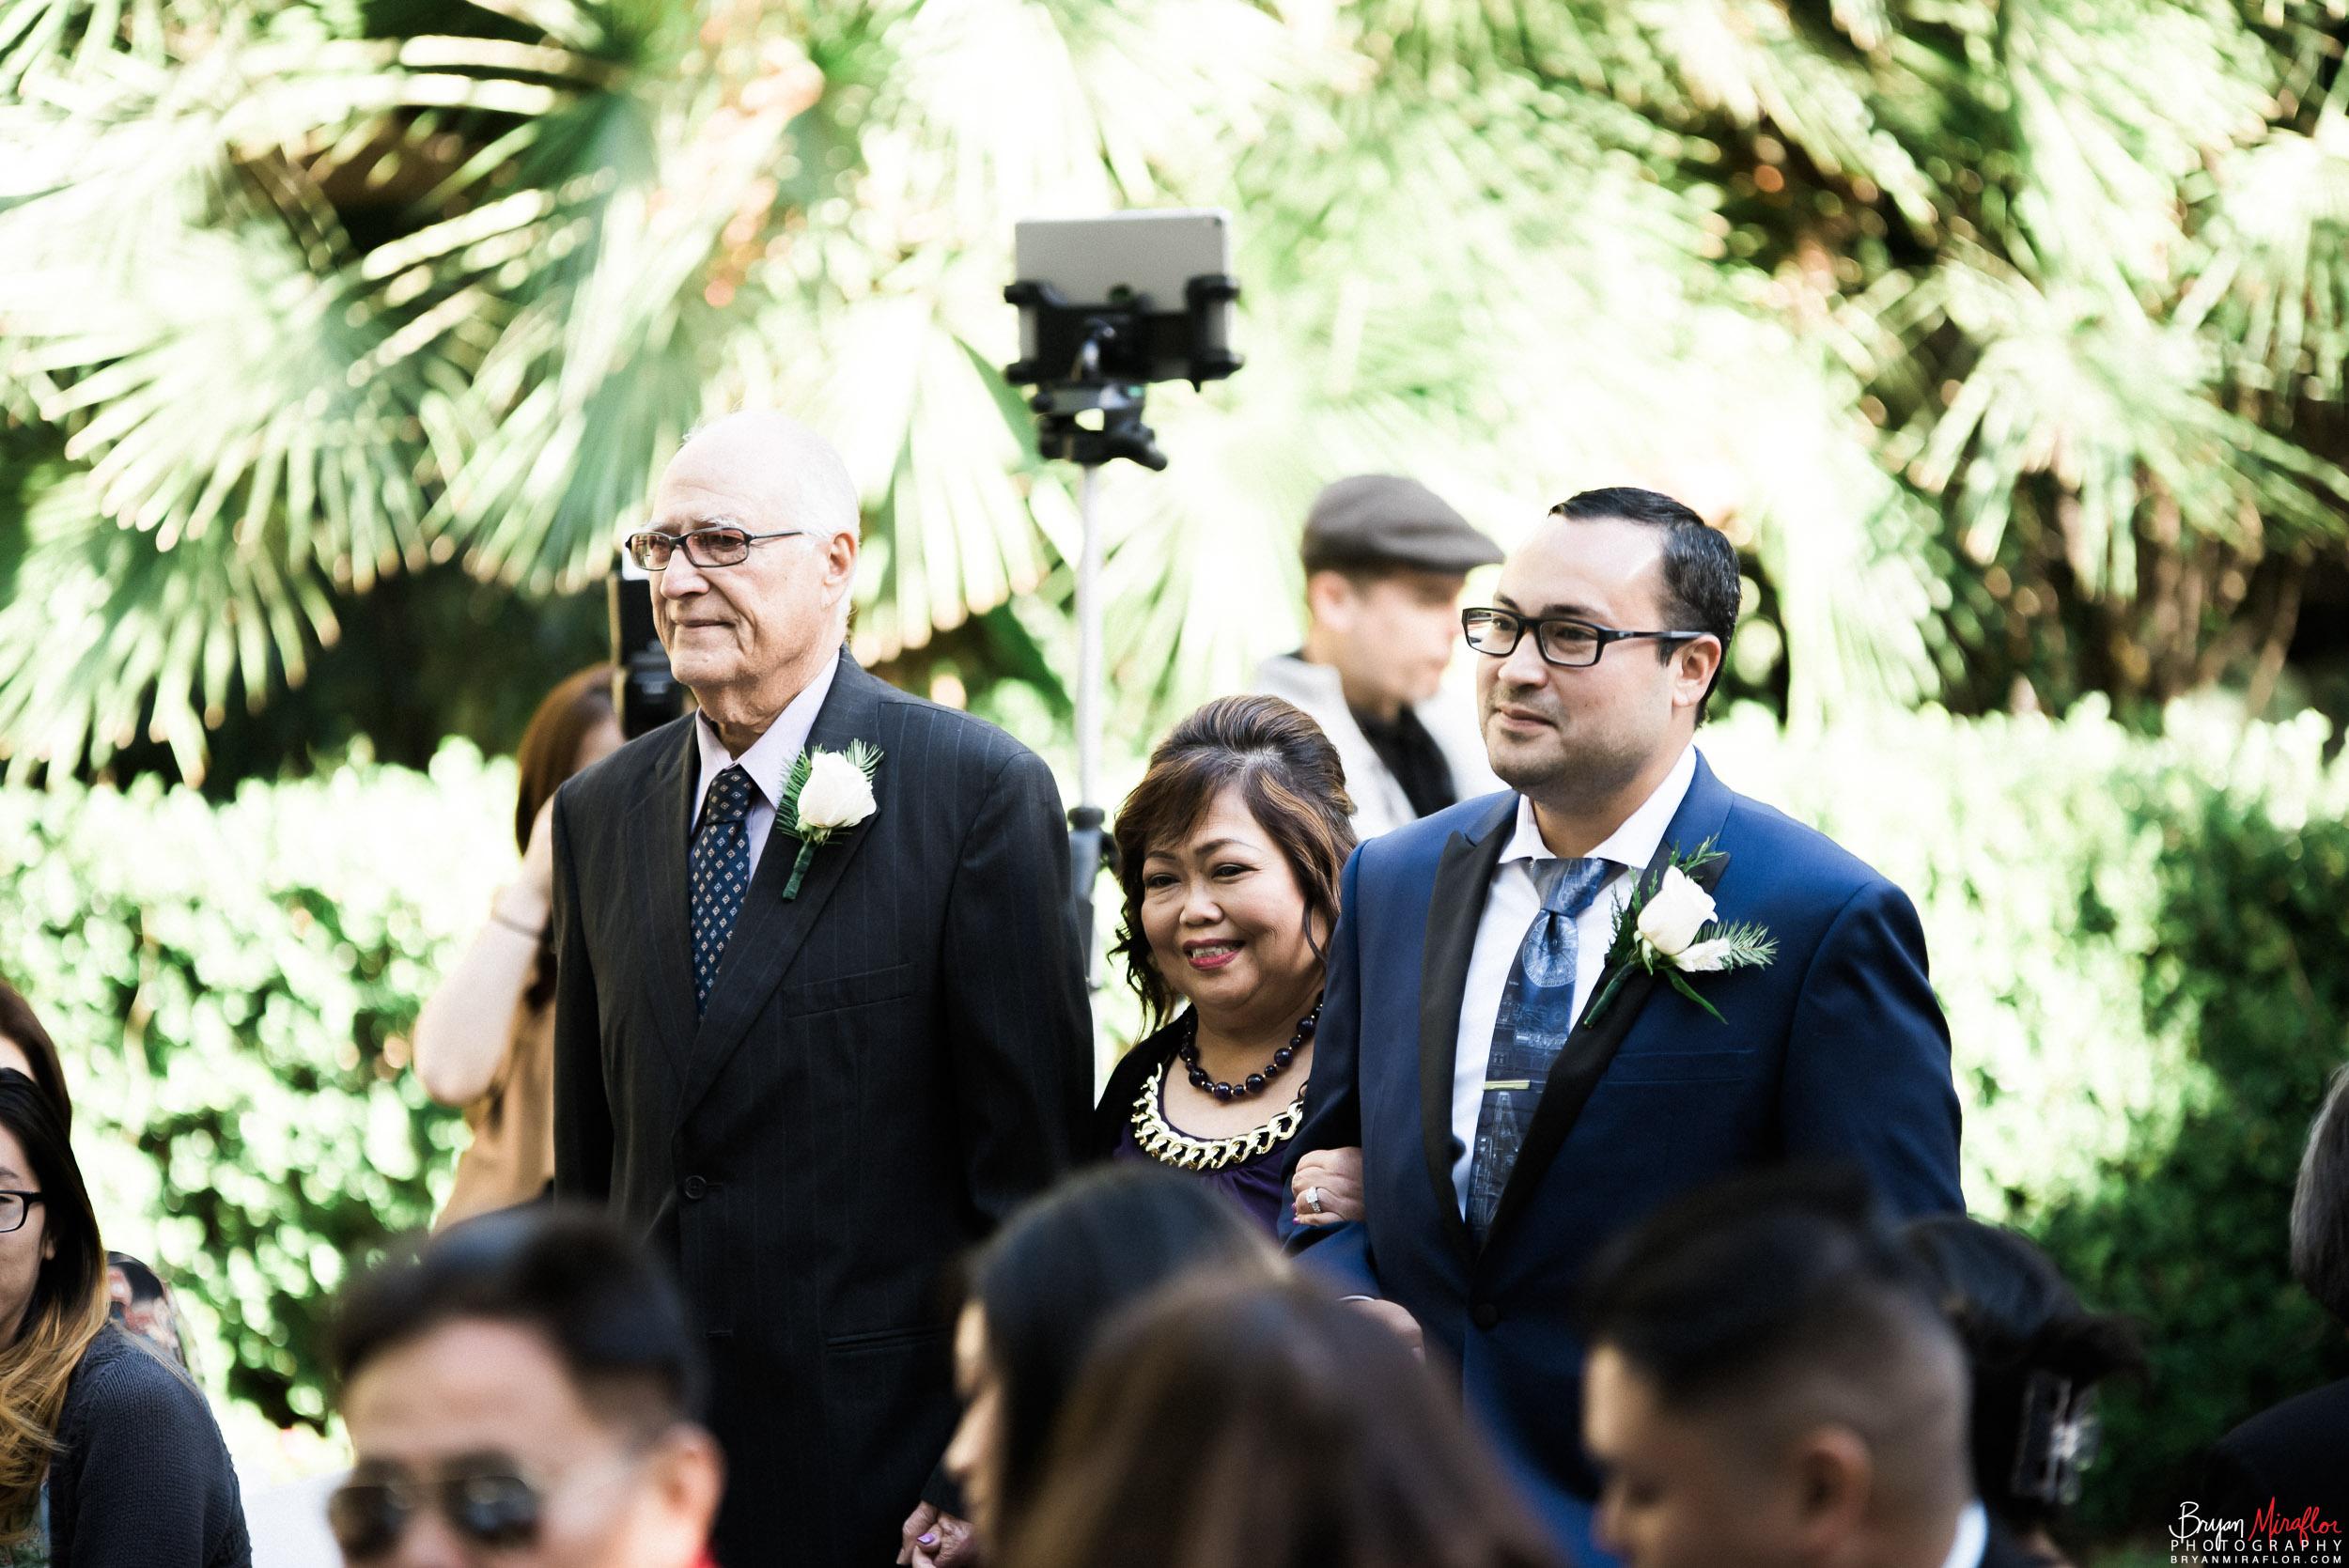 Bryan-Miraflor-Photography-Hannah-Jonathan-Married-Grand-Traditions-Estate-Gardens-Fallbrook-20171222-079.jpg